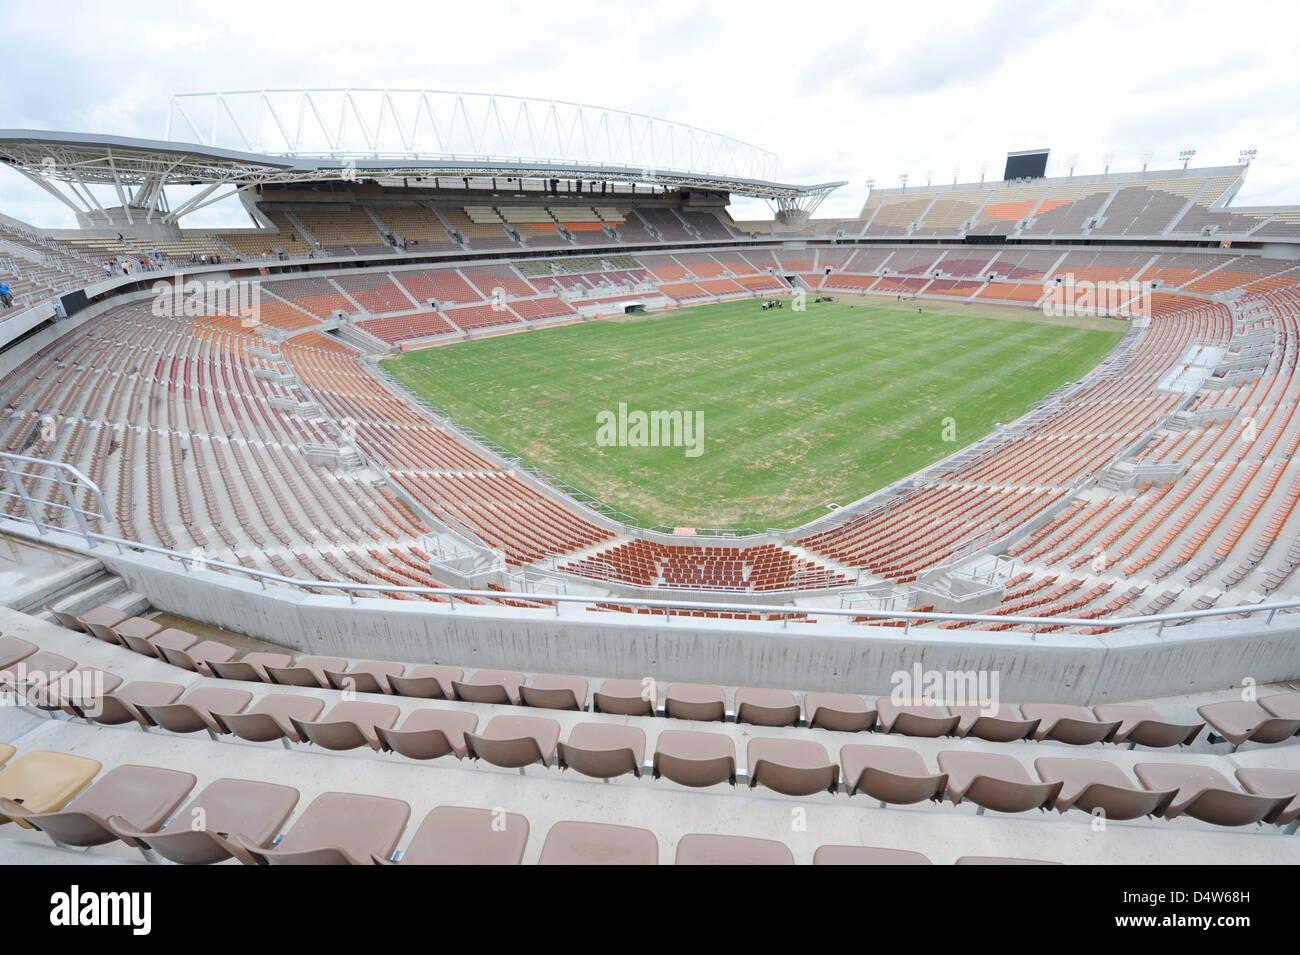 Das Peter Mokaba Stadion In Polokwane Südafrika 11 Dezember 2009